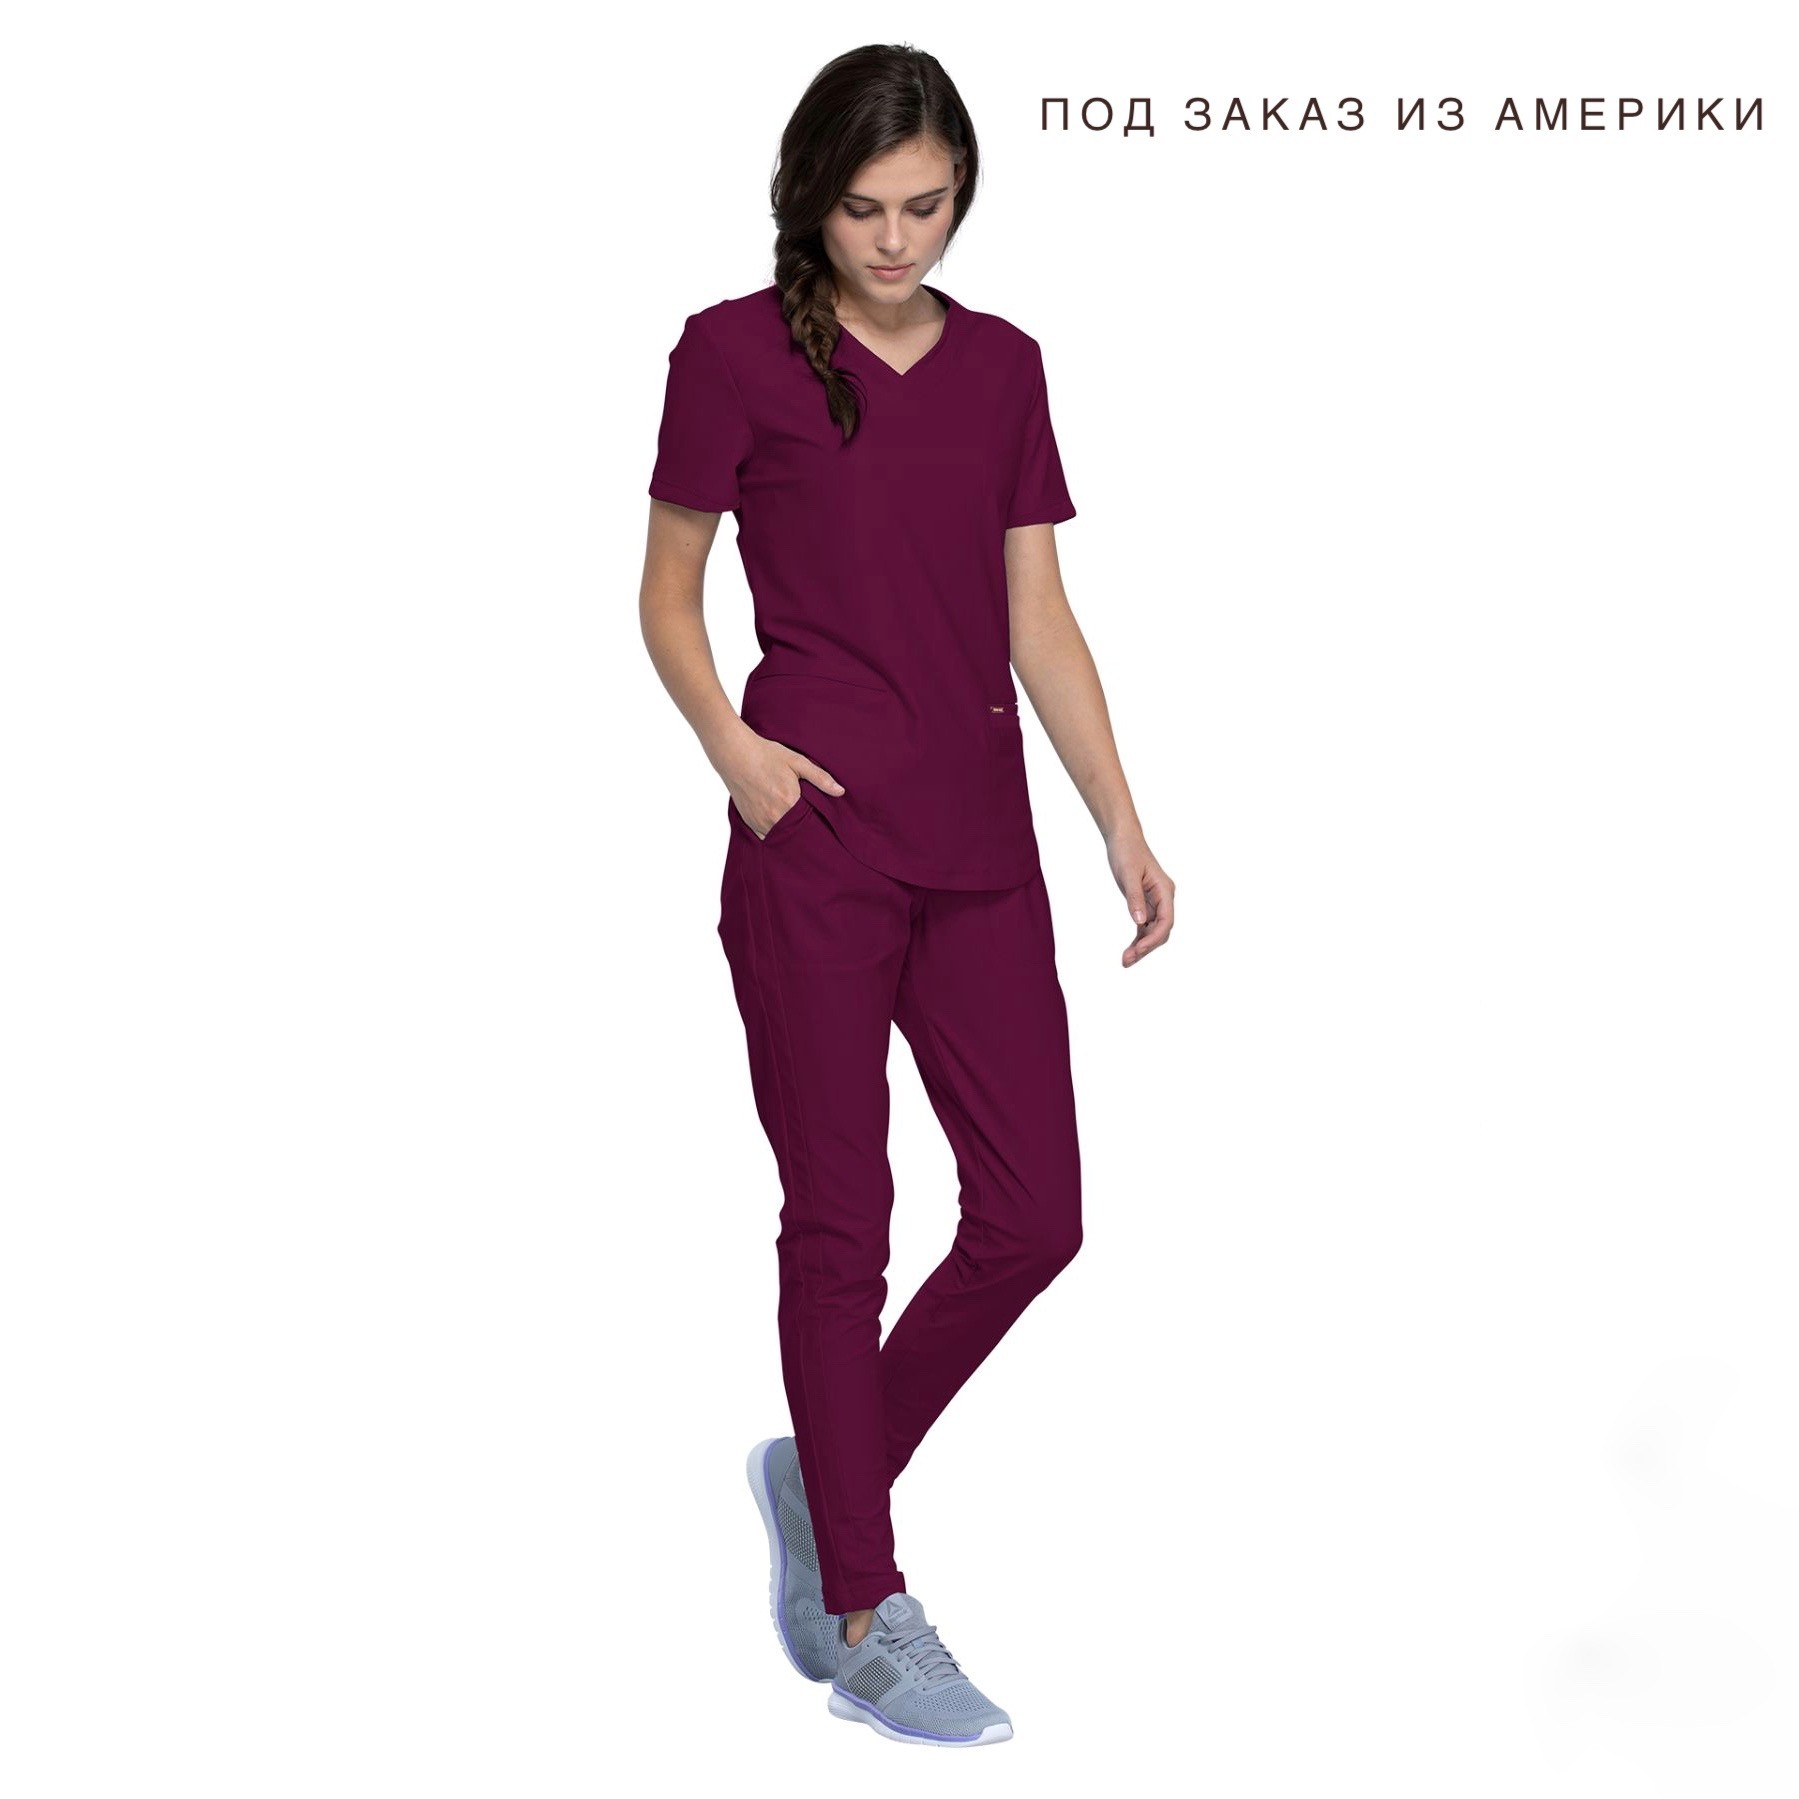 Женский медицинский костюм CHEROKEE FORM цвет WIN